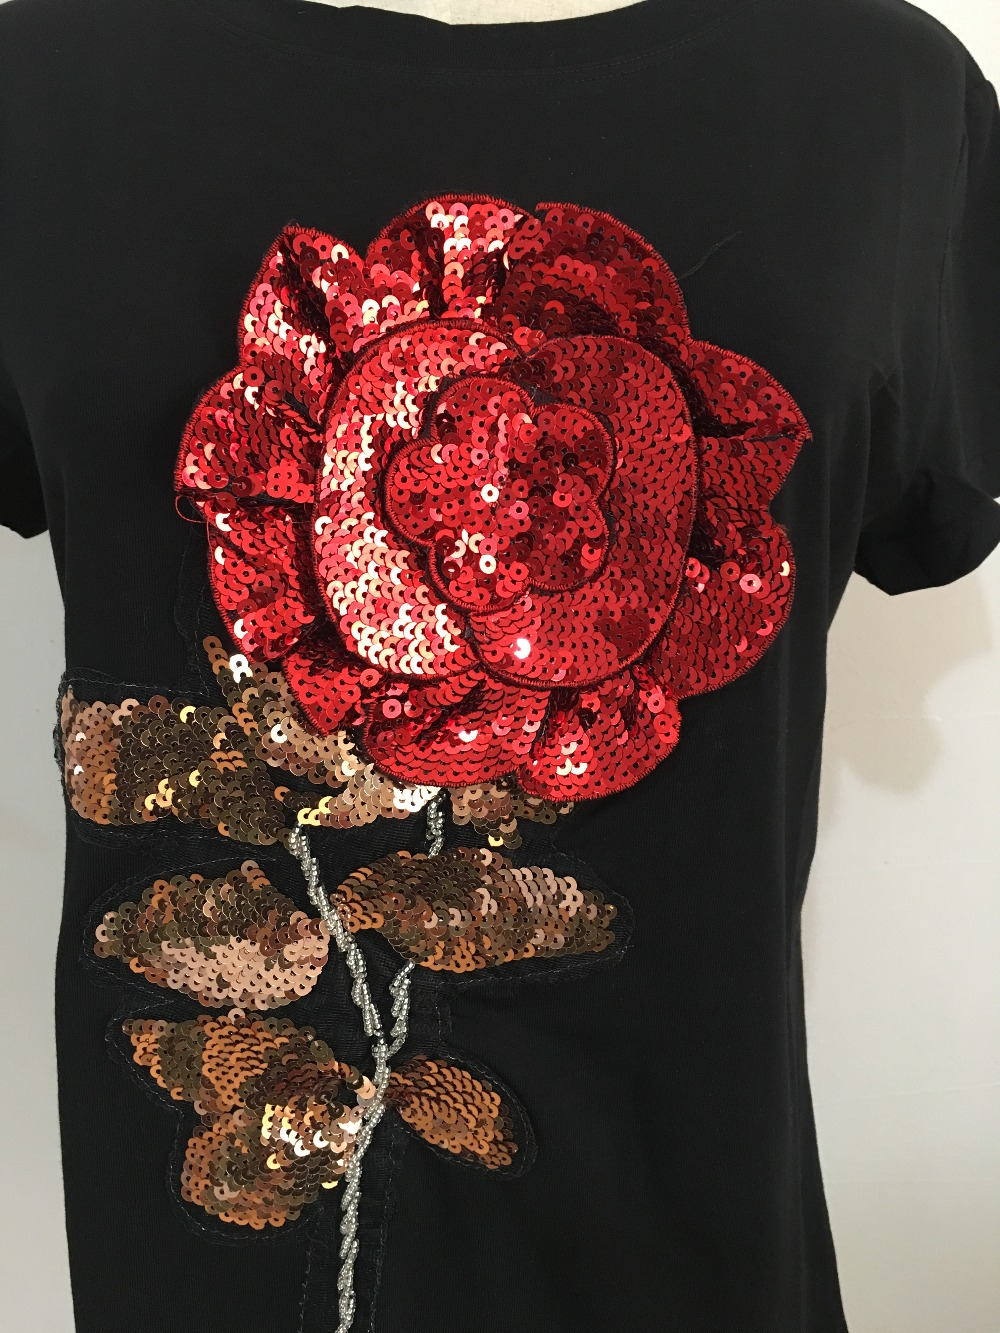 HTB1ZyG3SpXXXXbcXpXXq6xXFXXXF - New Summer women t shirt fashion cotton female rose flower tops t-shirt